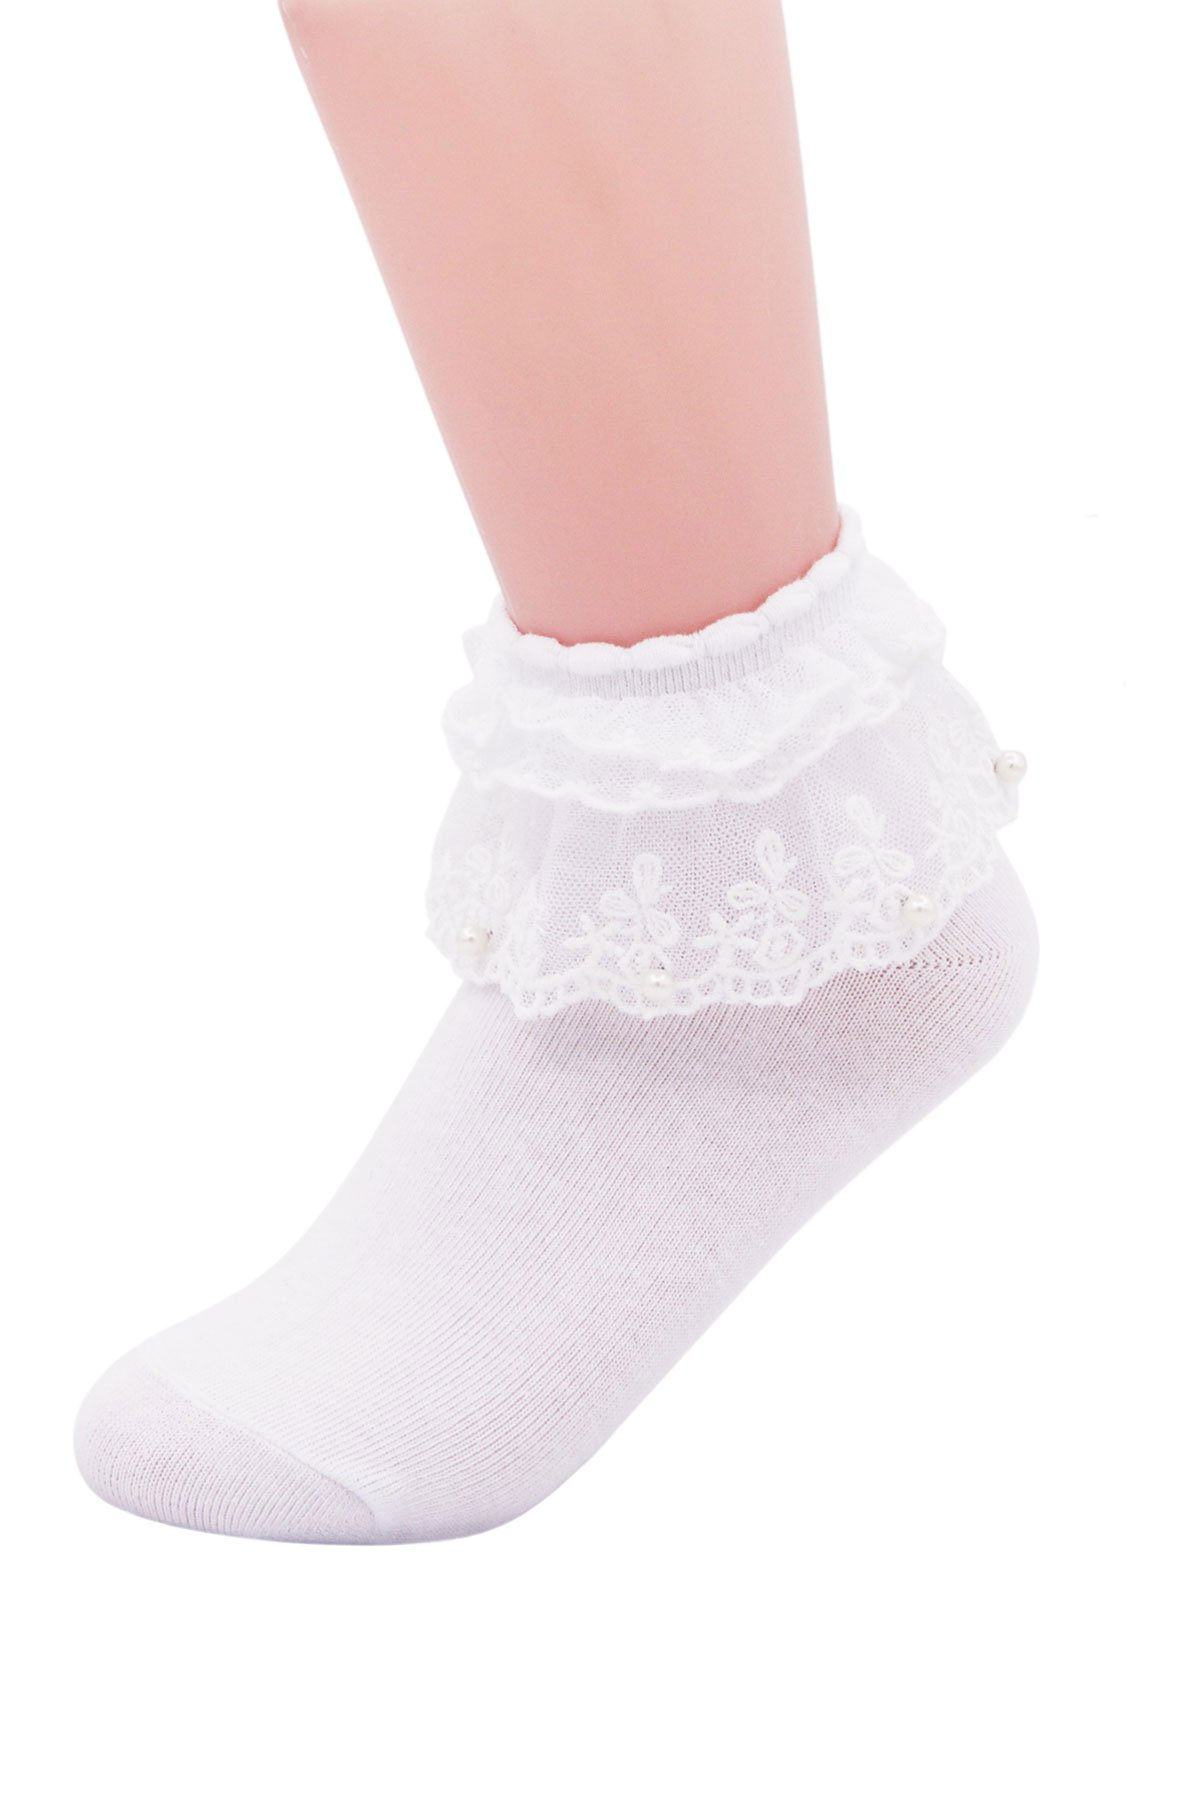 SEMOHOLLI Women Ankle Socks,Pearl Lace Ruffle Frilly Comfortable No-Show Cotton Socks Princess Socks Lace Socks